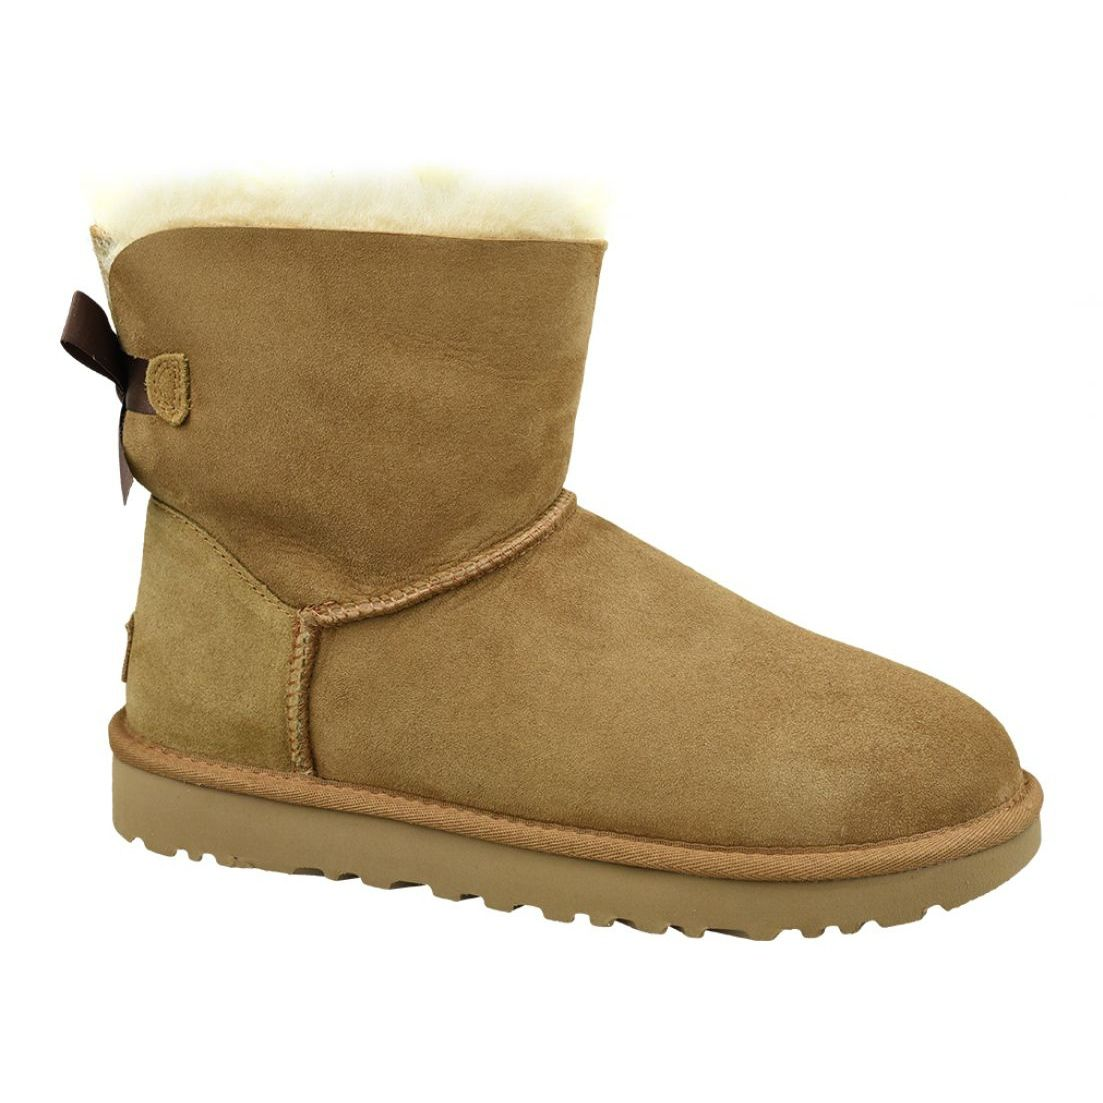 Buty Ugg Mini Bailey Bow Ii W 1016501 Che Brazowe In 2021 Ugg Mini Brown Boots Women Mini Baileys